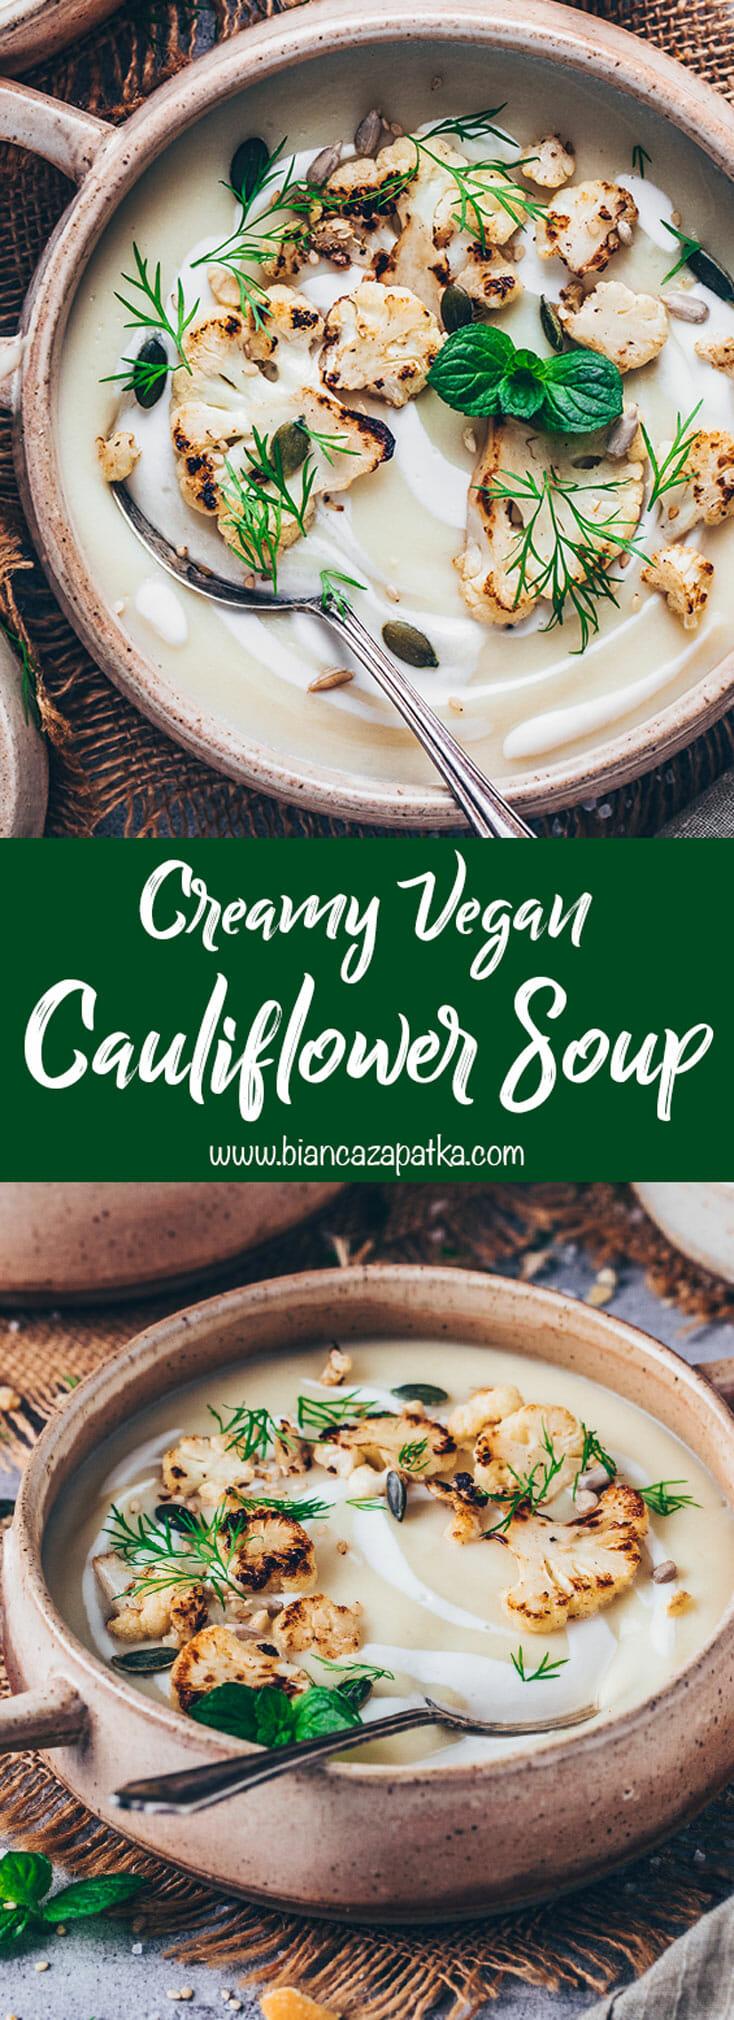 creamy cauliflower soup (best, easy, vegan)